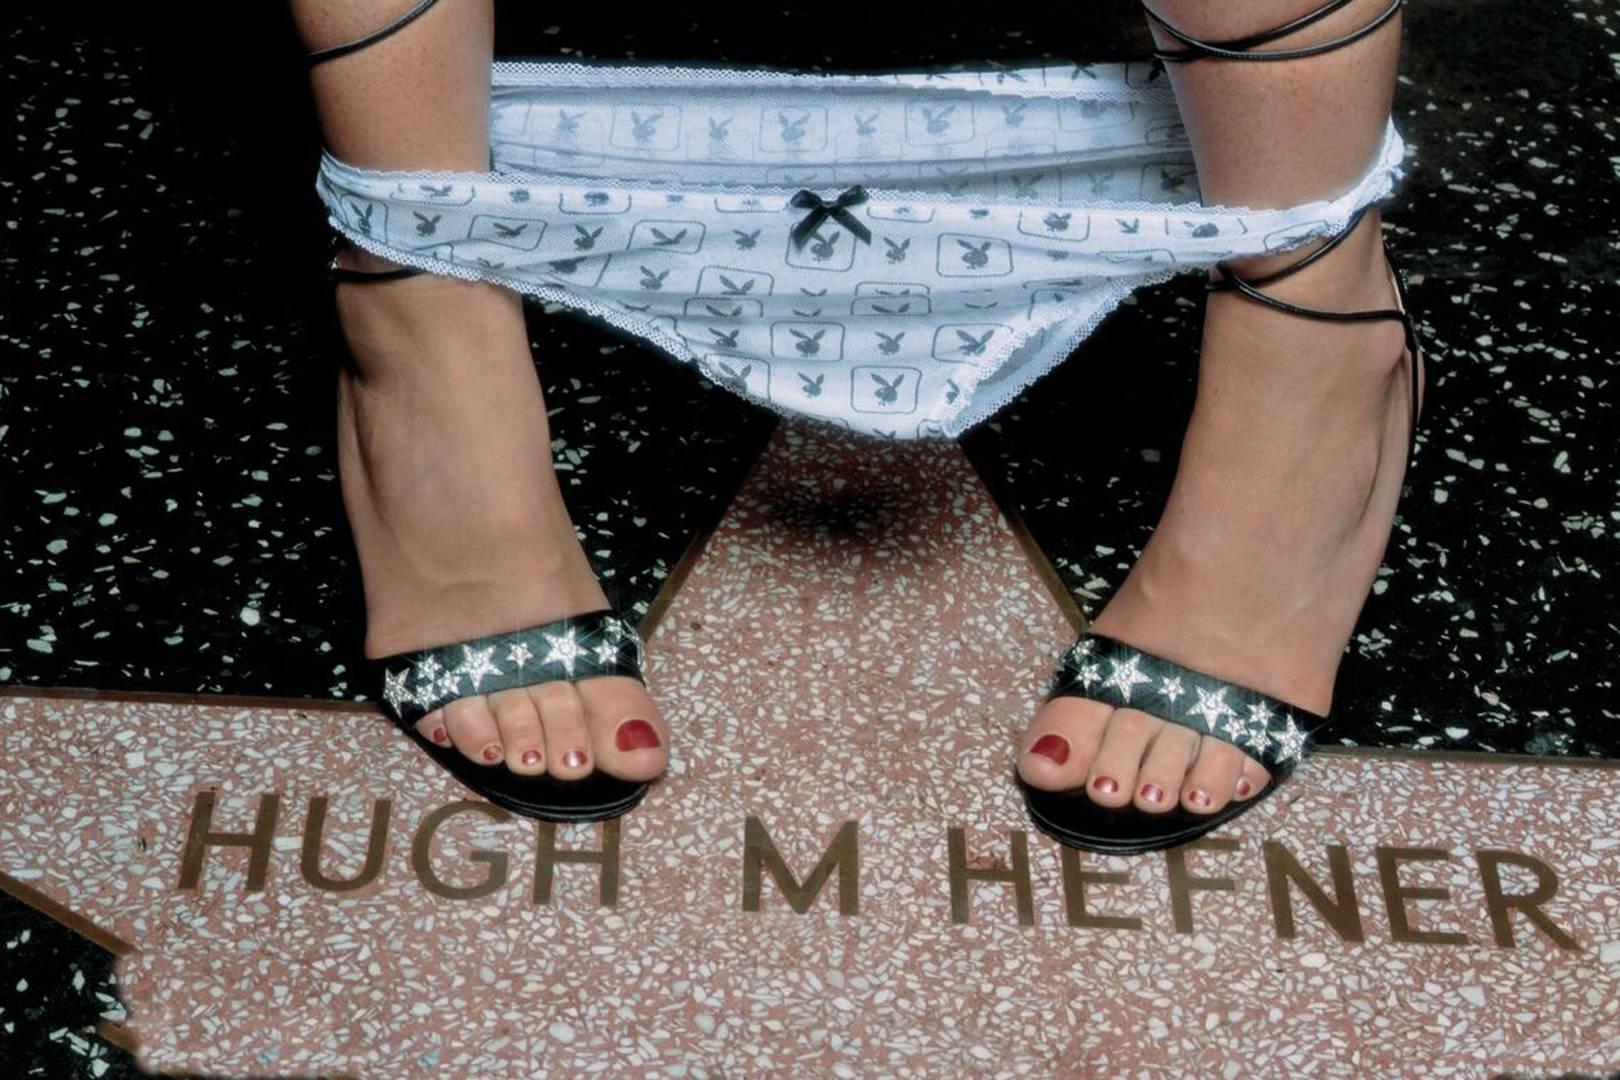 Hugh Hefner An Oral History British Gq